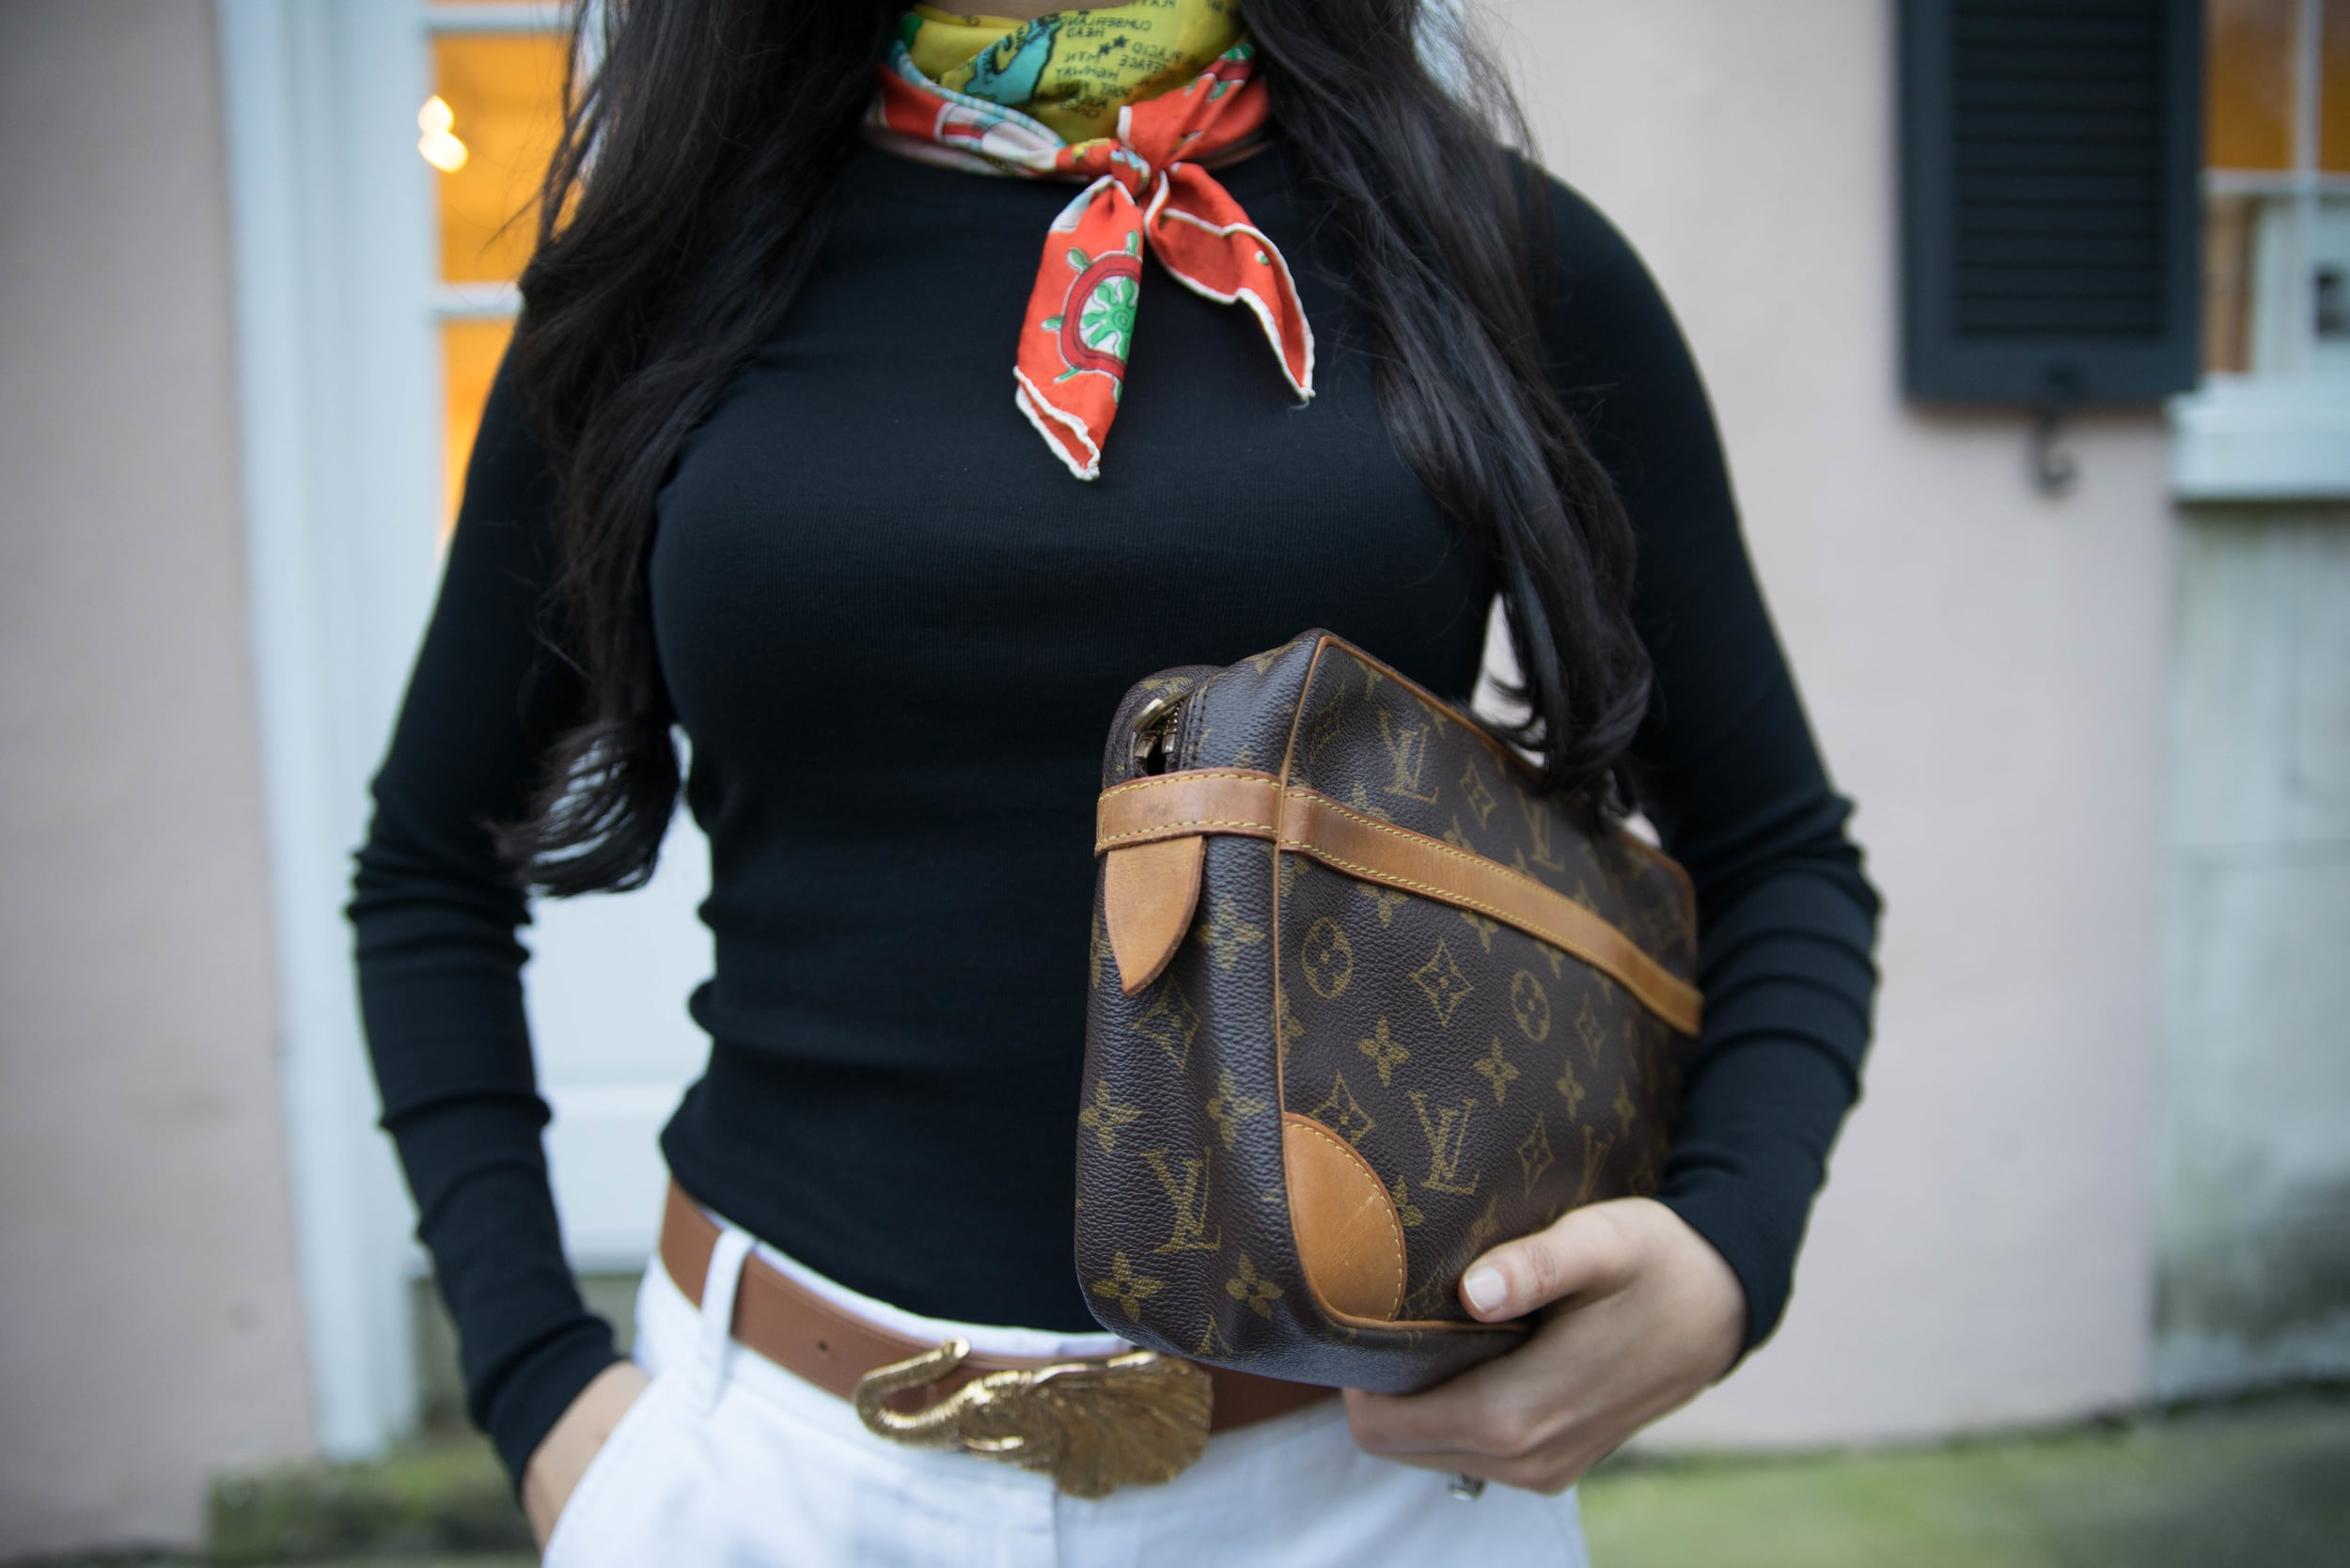 Vintage Nautical Print Silk Scarf Black J Crew T Louis Vuitton Clutch J Crew Chino Shorts Gucci Horsebit Loafers